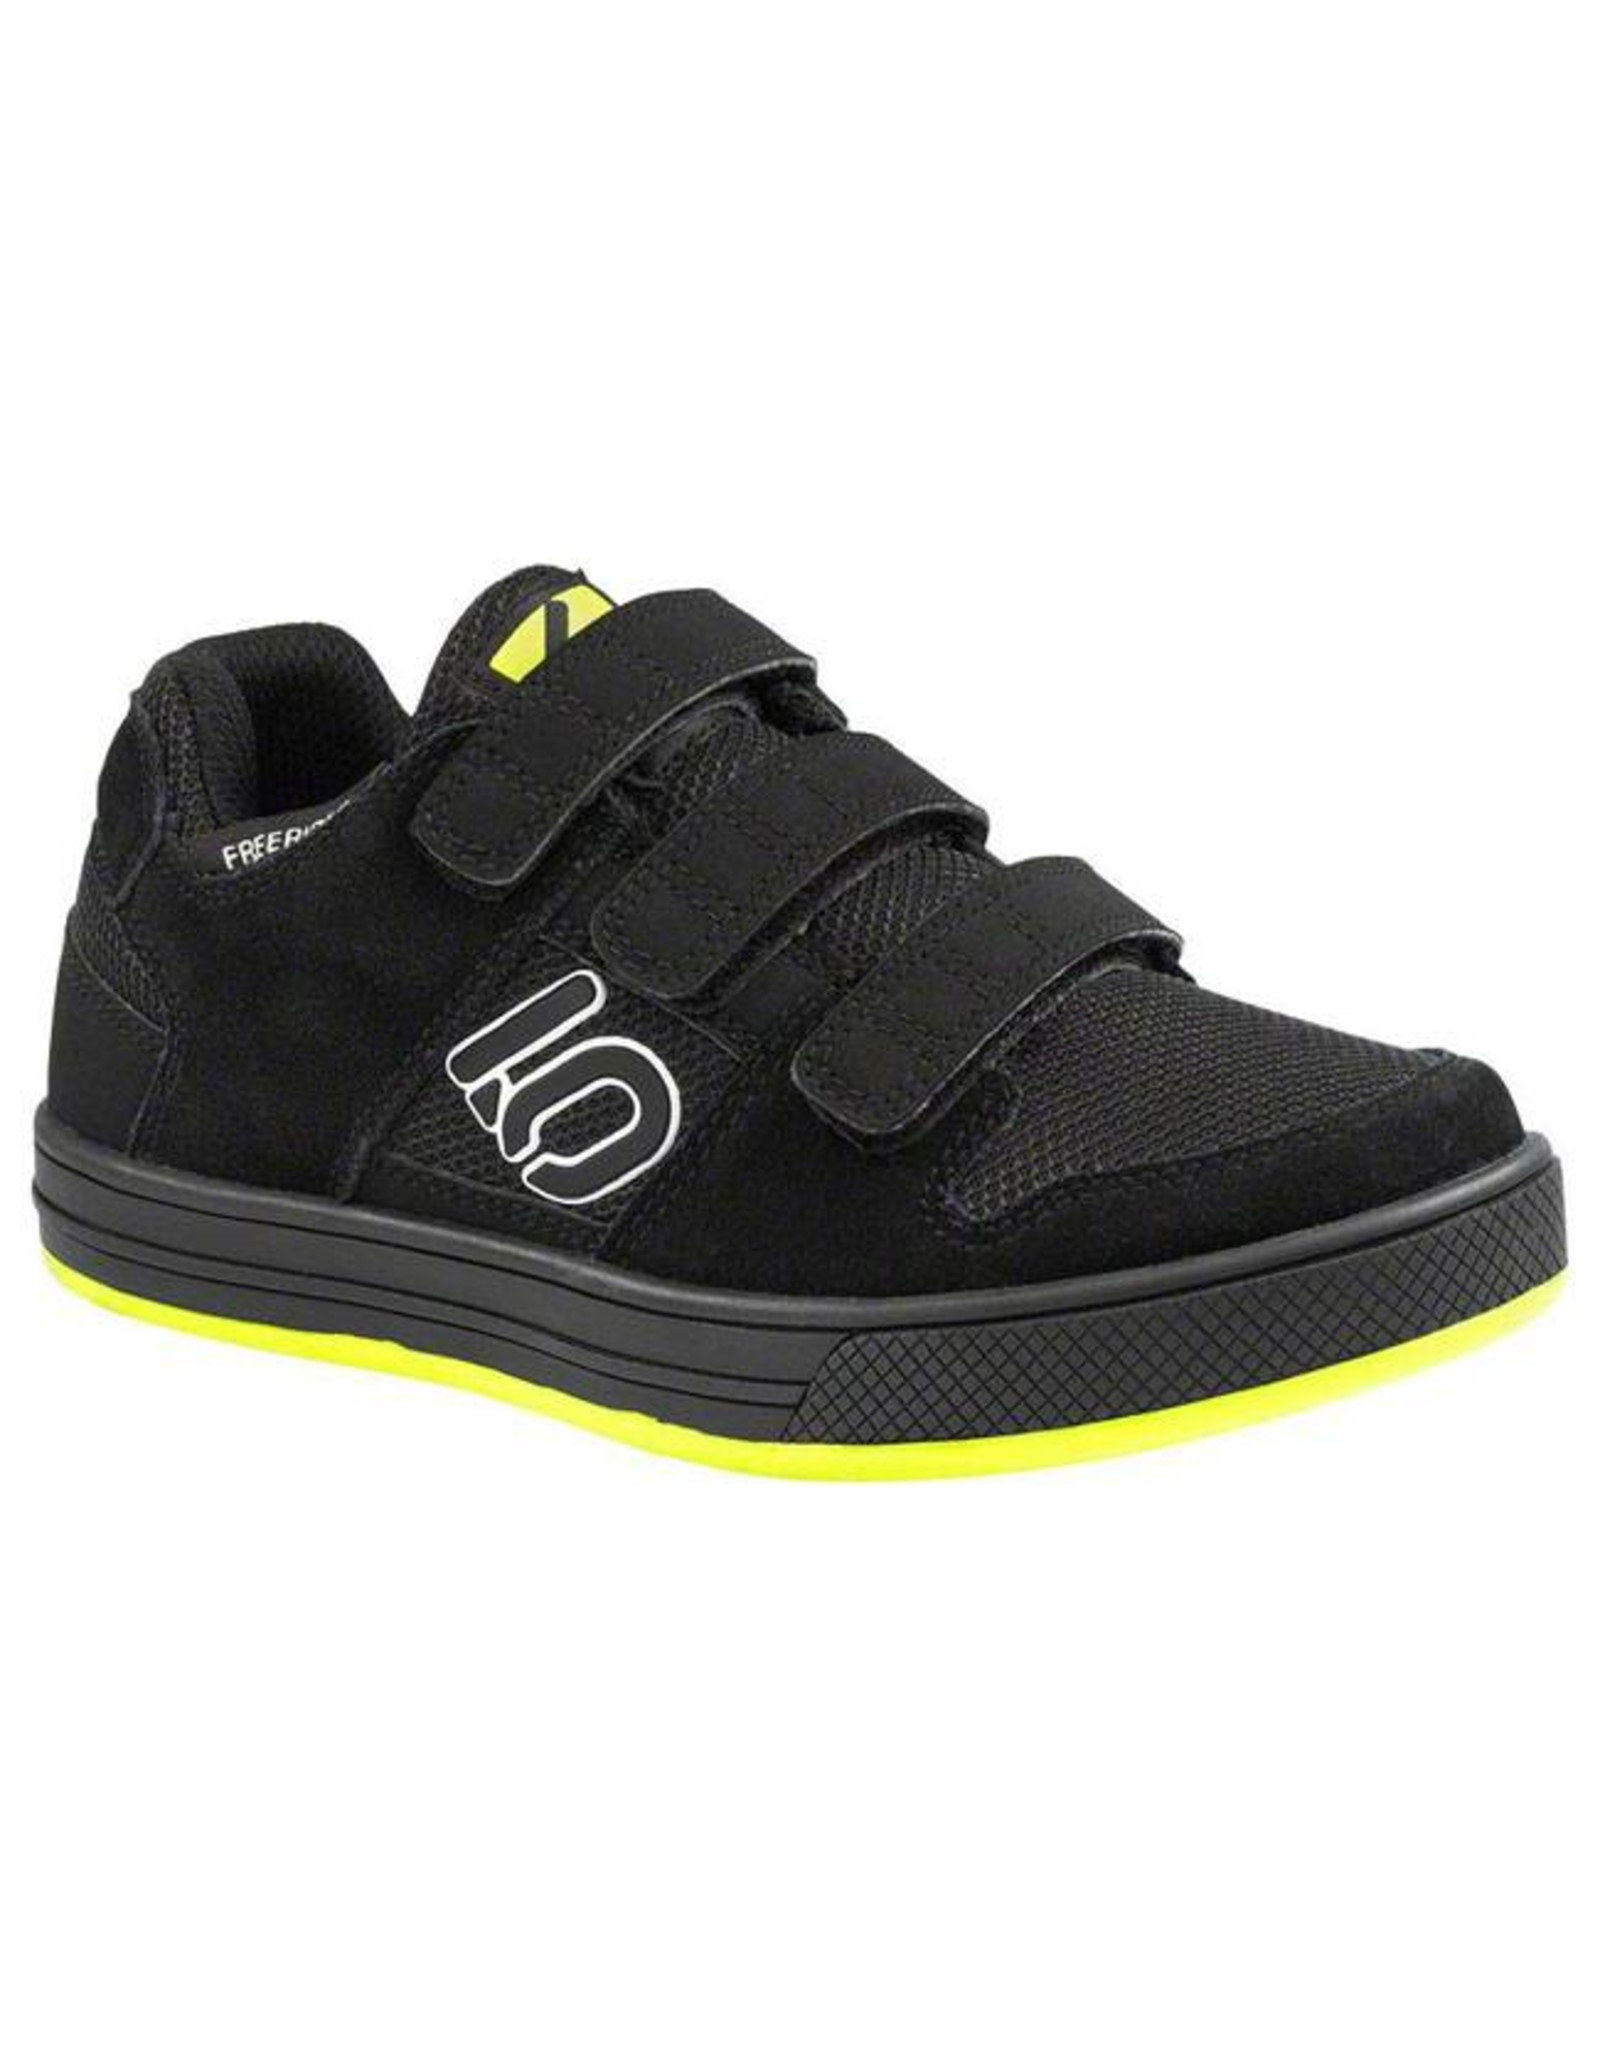 Five Ten Five Ten Freerider Kid's Flat Pedal Shoe: Black 1.5